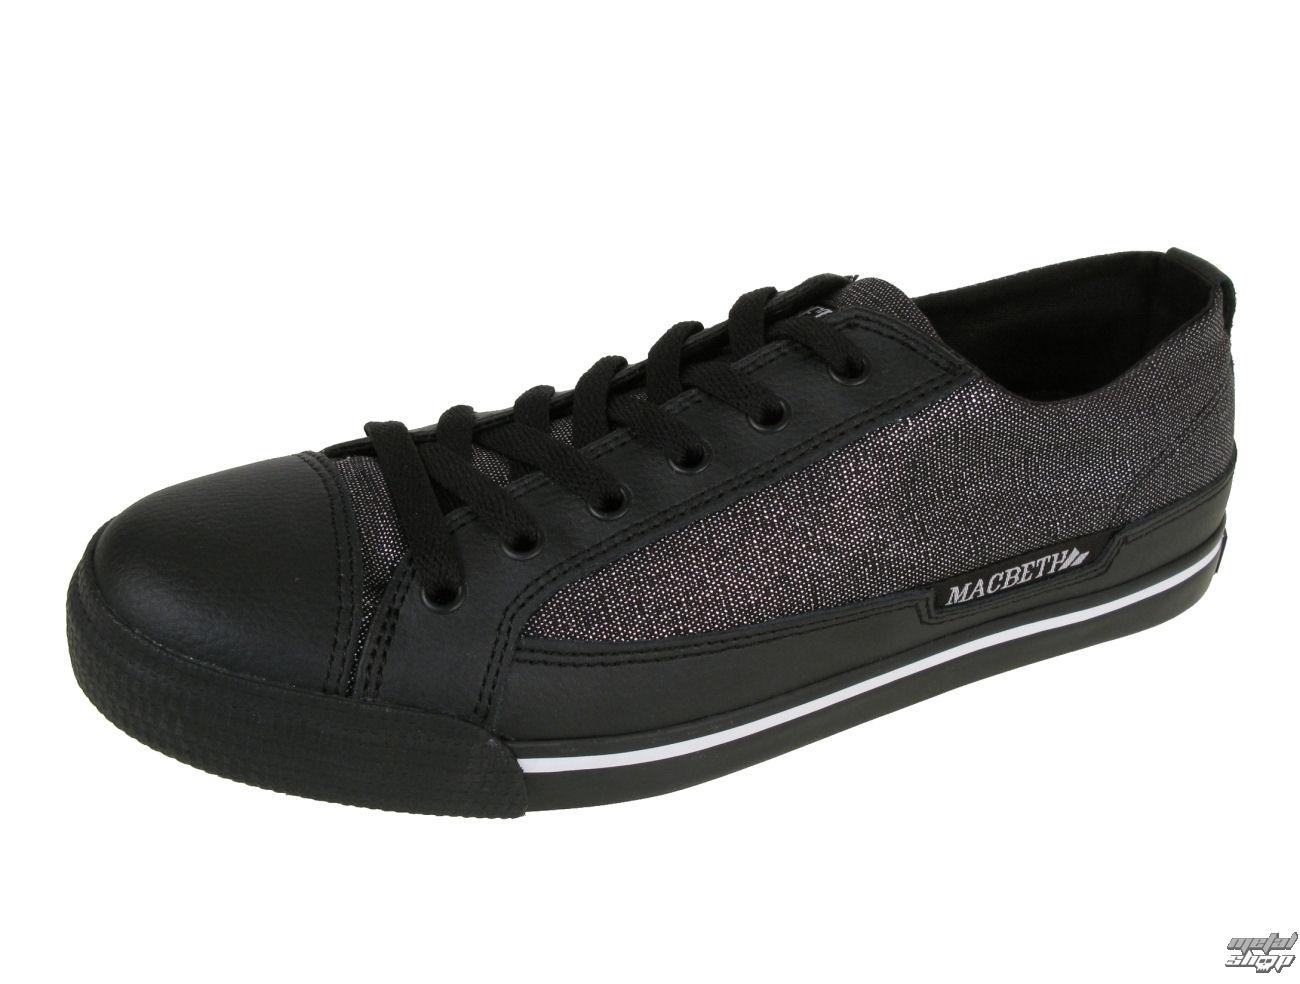 new product 159dd 29a5a Schuhe MACBETH - Matthew